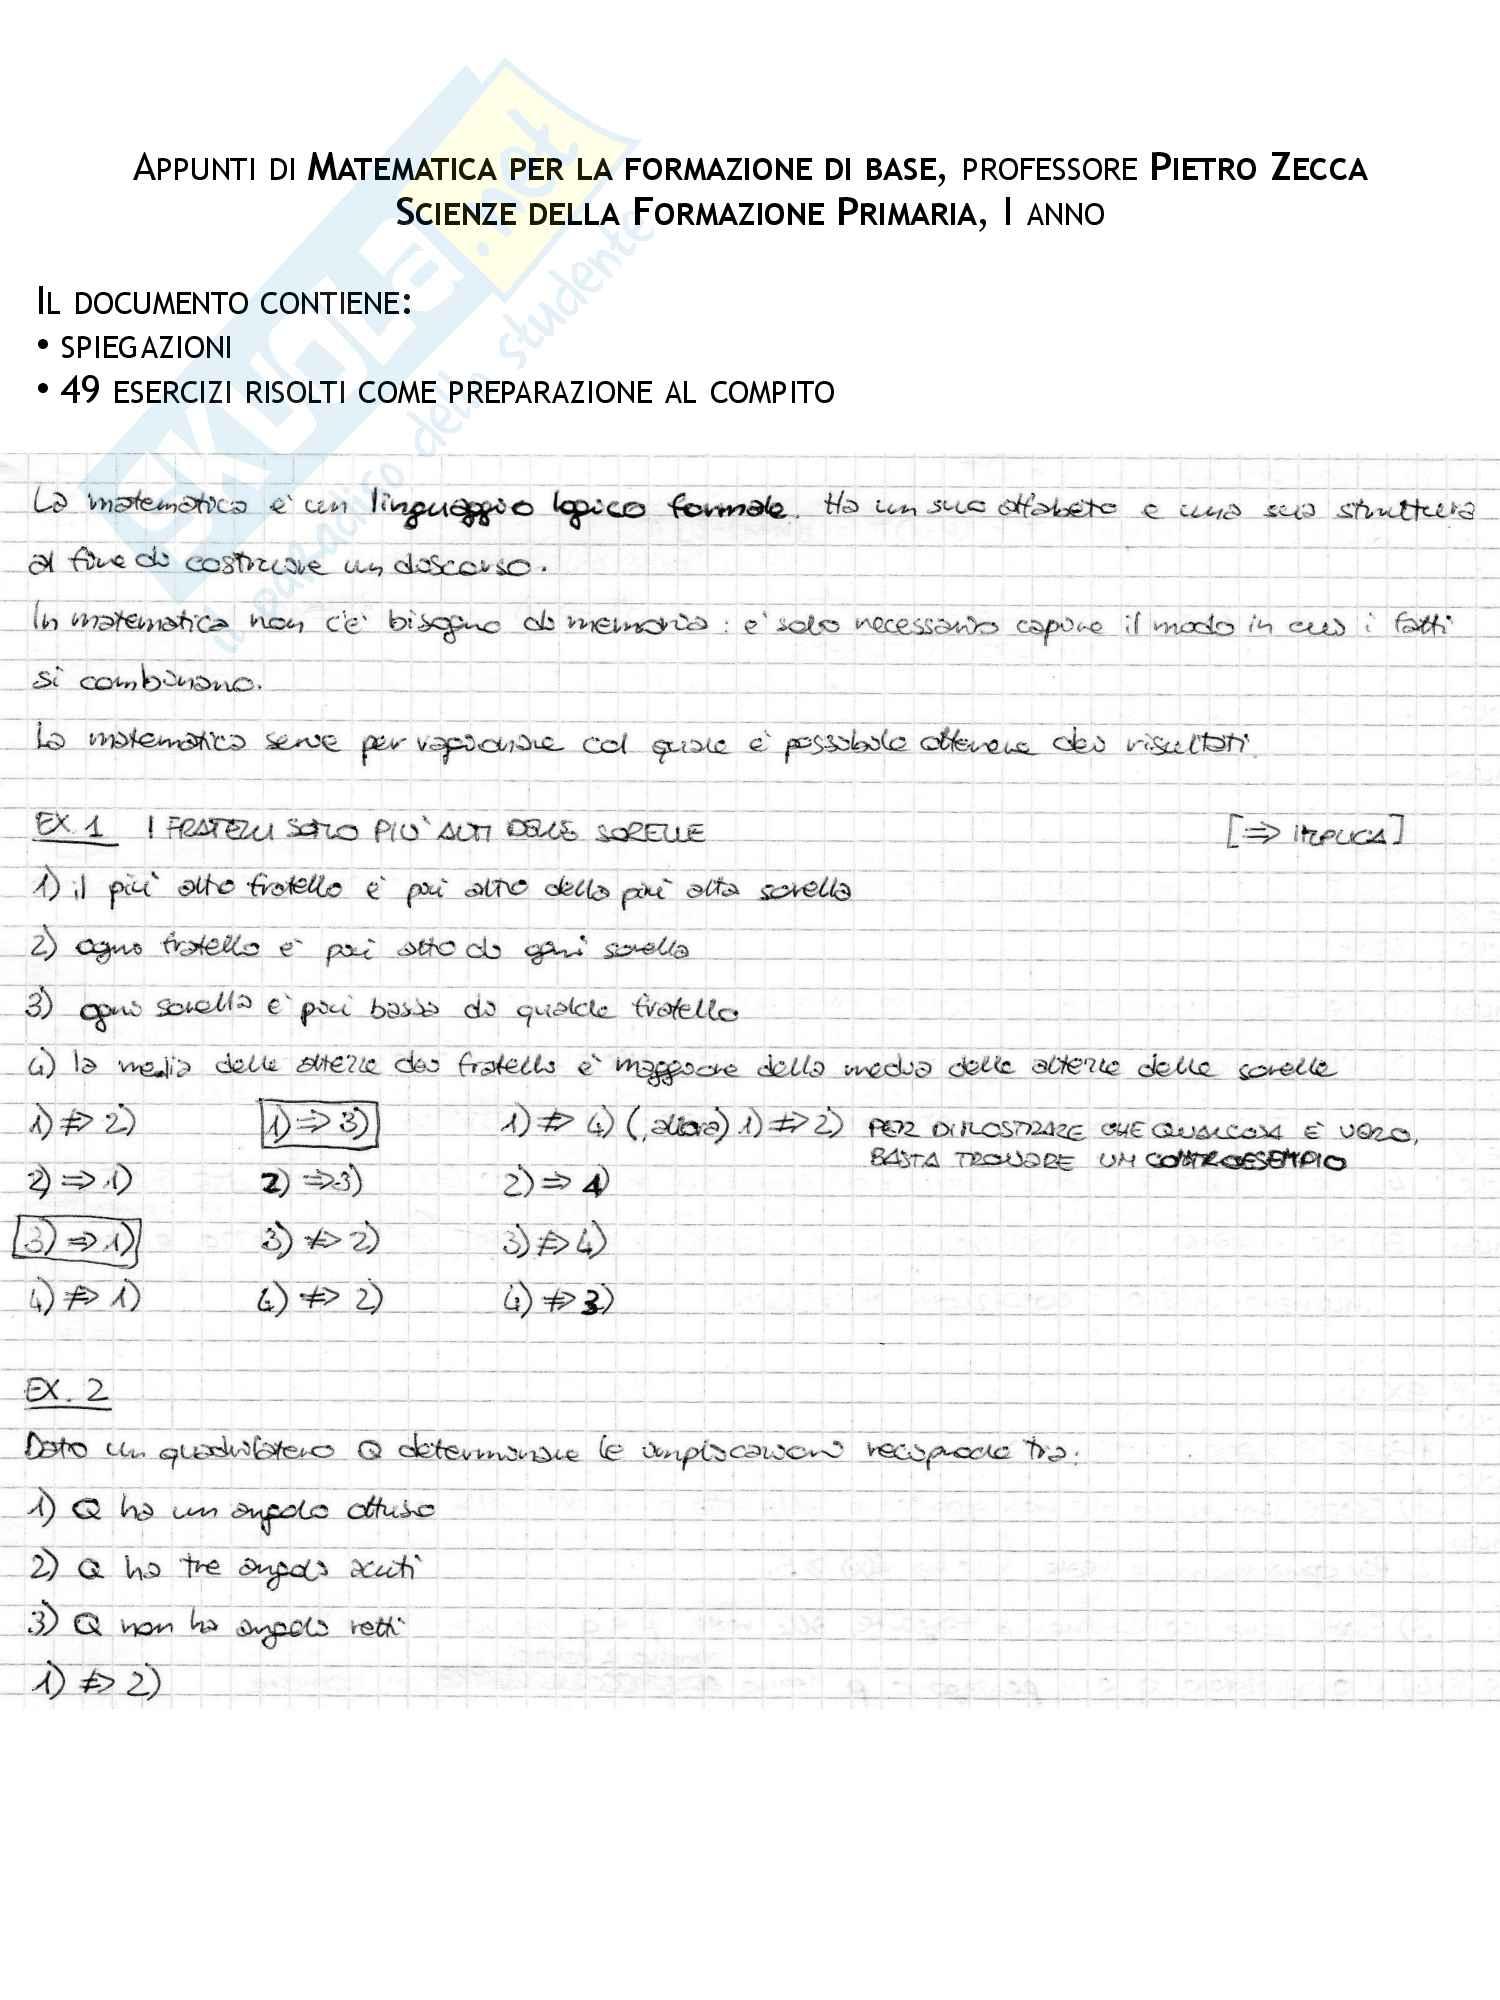 appunto P. Zecca Matematica di base